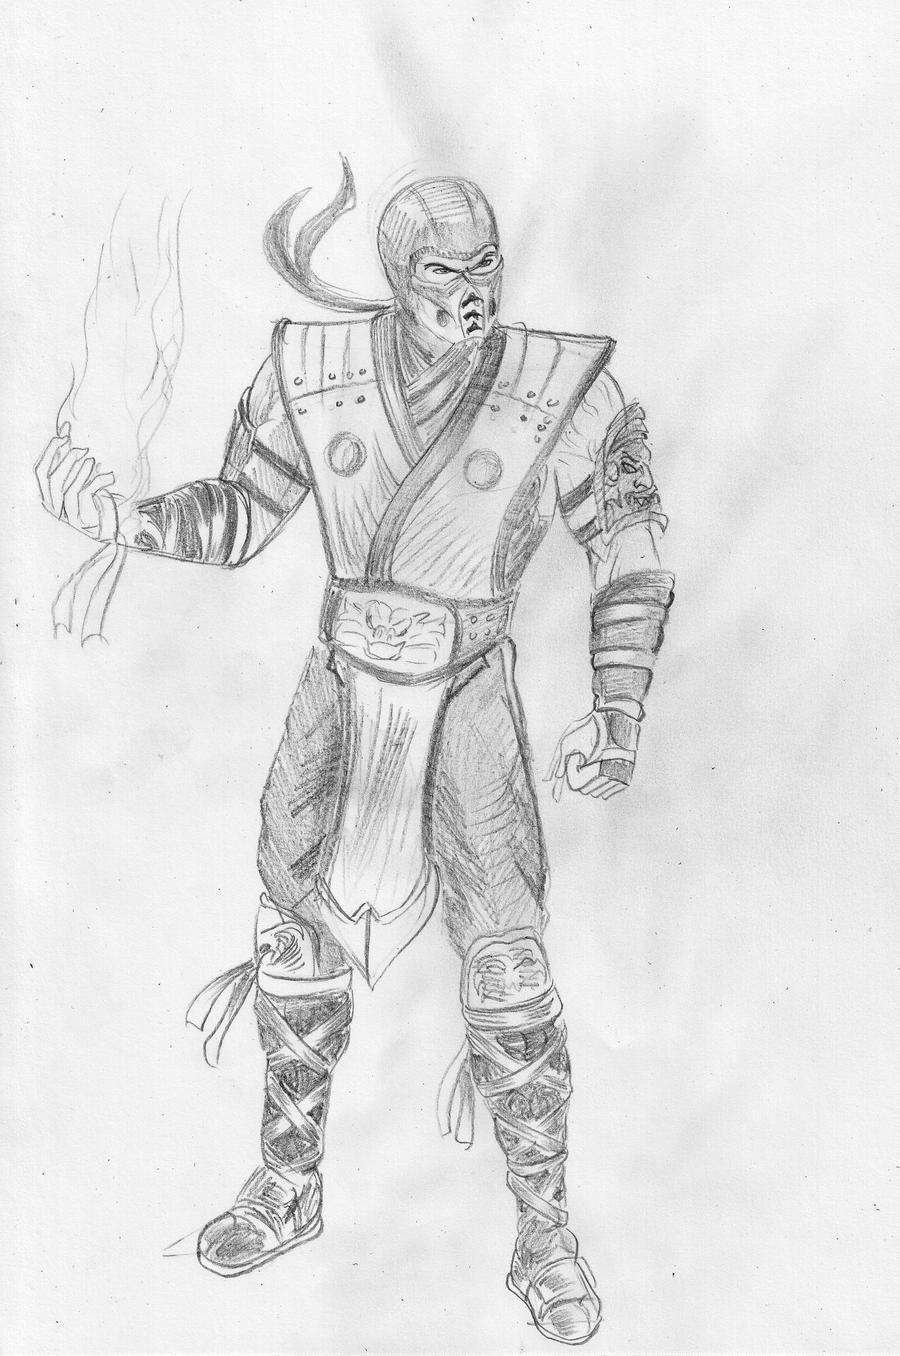 Mortal Kombat 2011 Sub-zero by gamerfan2000